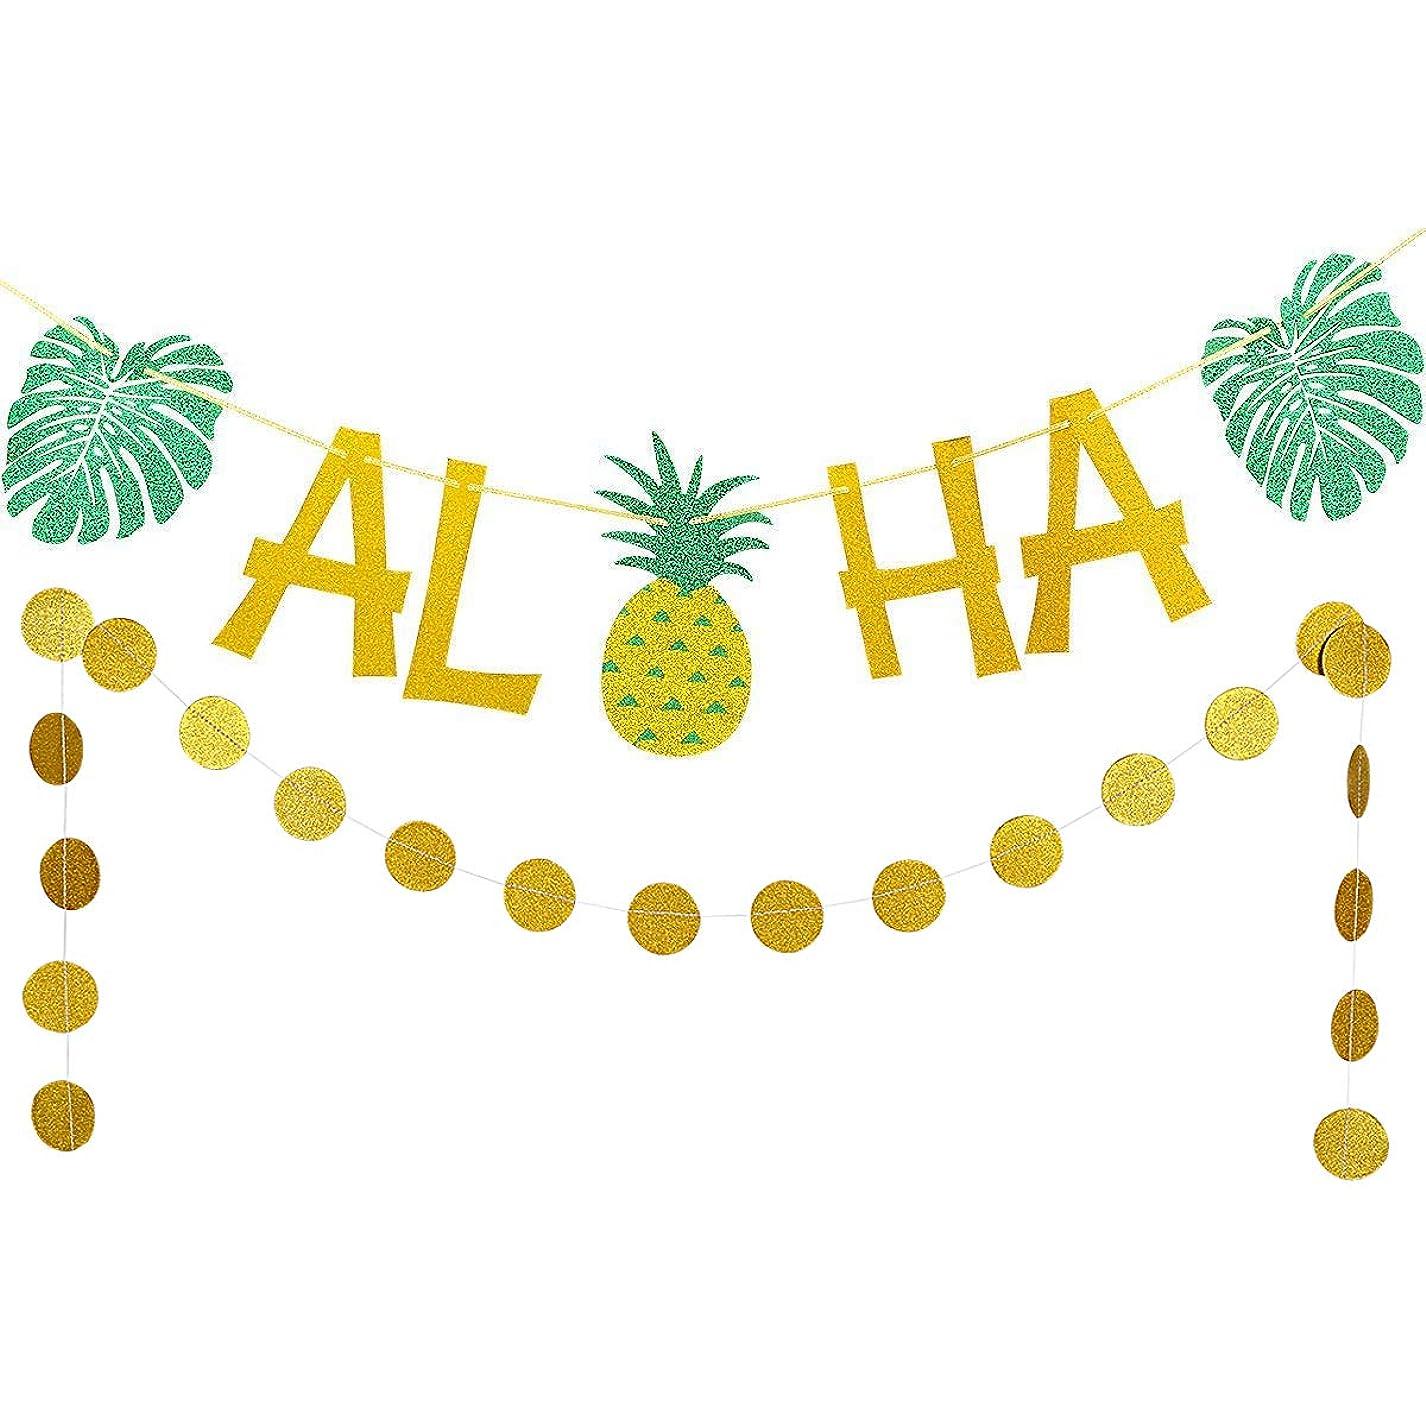 Gold Glittery ALOHA Green Leaves Pineapple Garland and Gold Glittery Circle Dots Garland(25pcs Circle Dots),Hawaiian Tropical Luau Beach Summer Party Decoration Supplies rkd432350584814